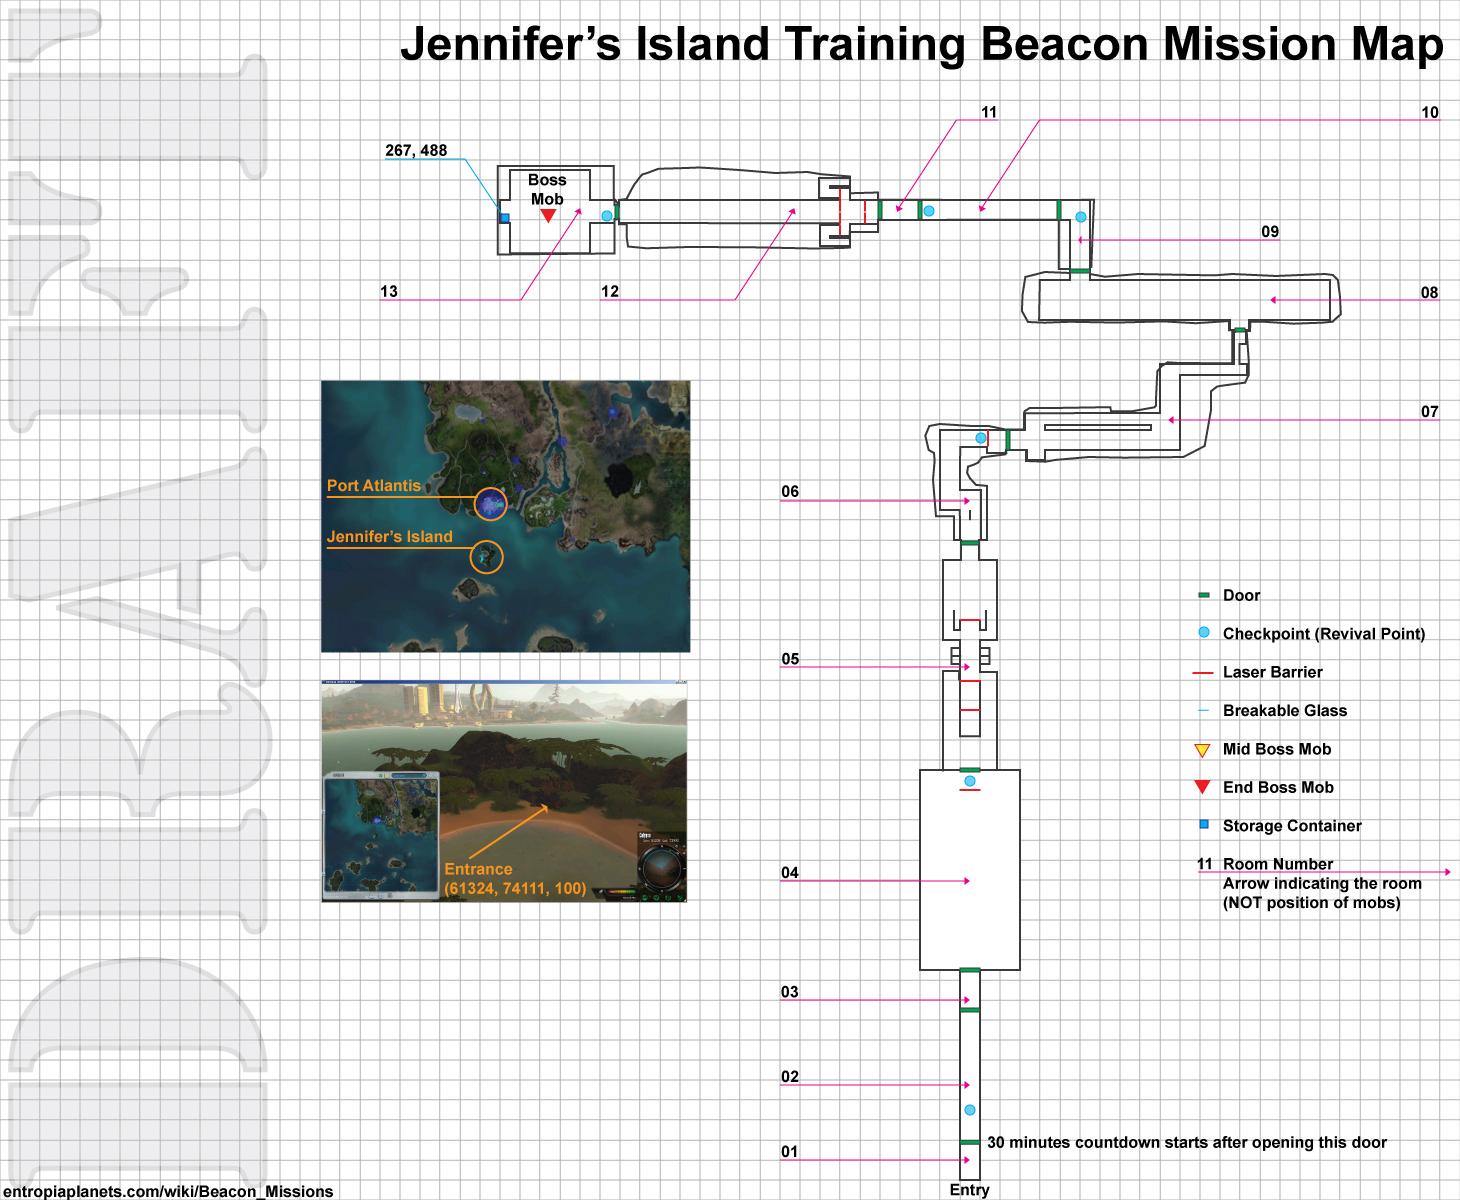 Jennifers Island Training Beacon Mission Map.jpg